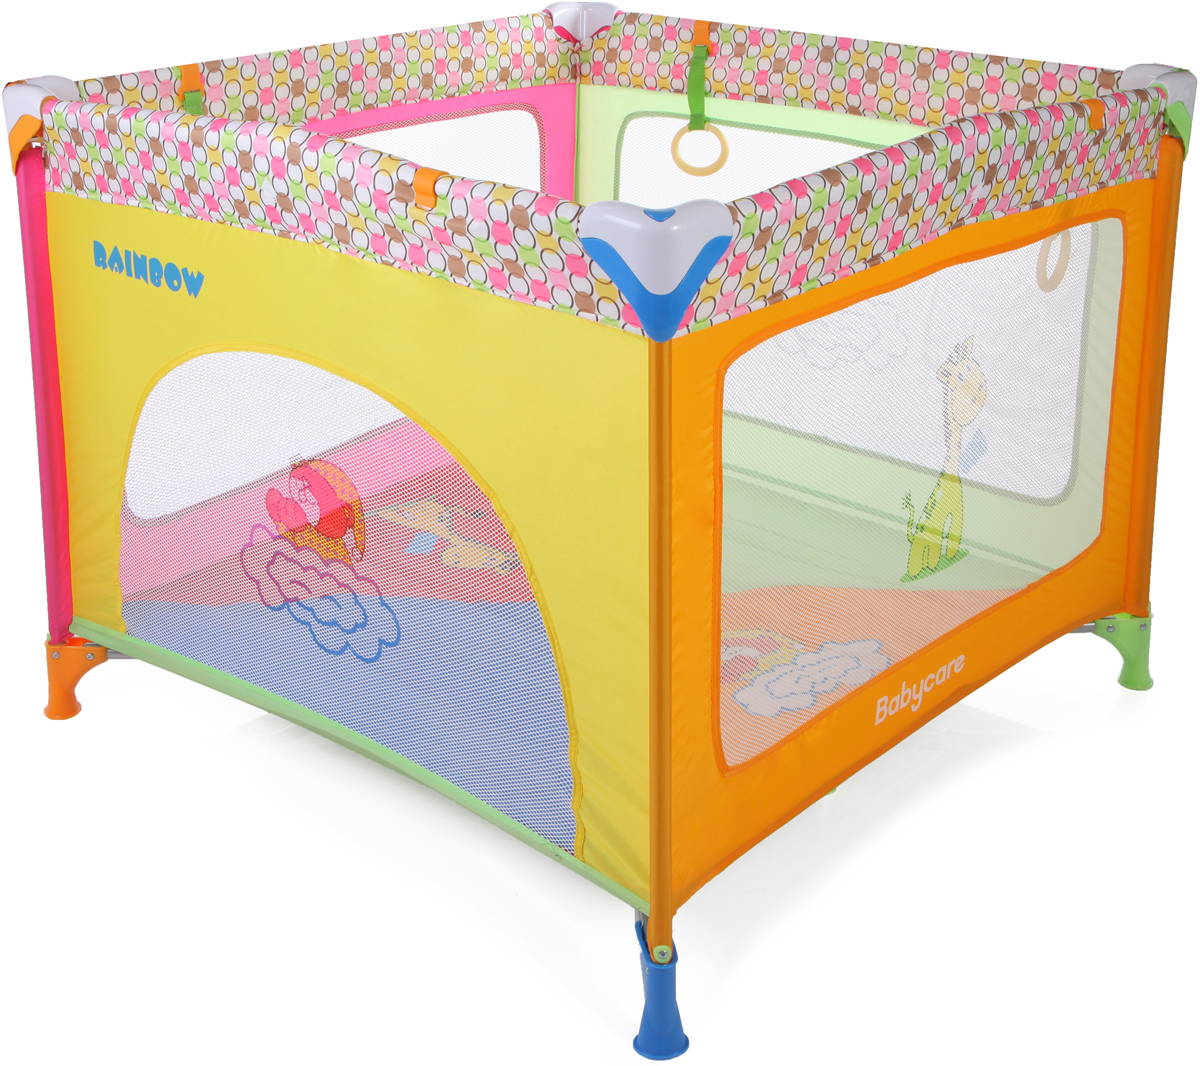 Baby Care Манеж Rainbow цвет разноцветный манеж baby care rainbow p02 f